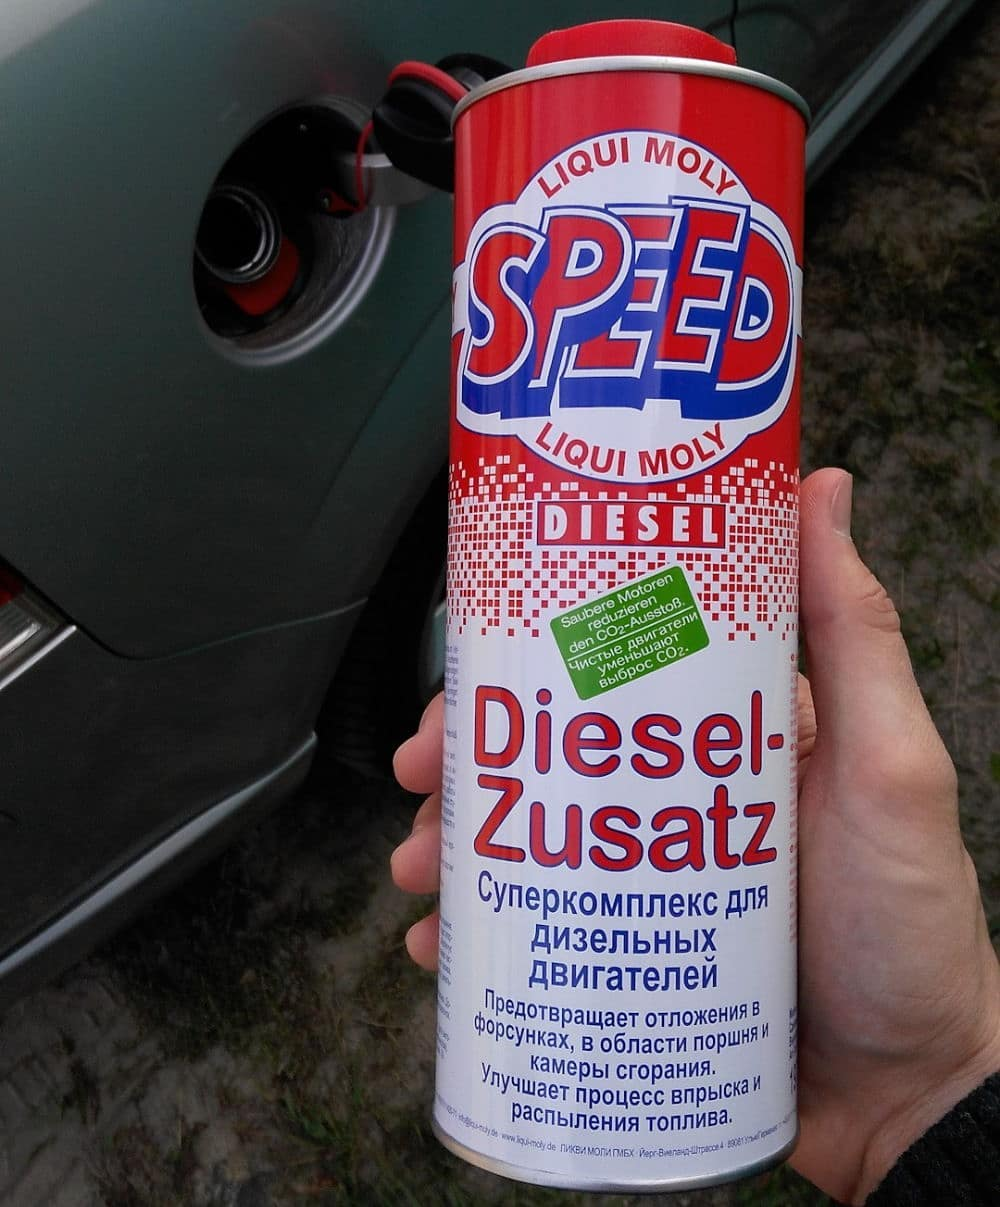 Liqui Moly Diesel Zusatz залиска в бак